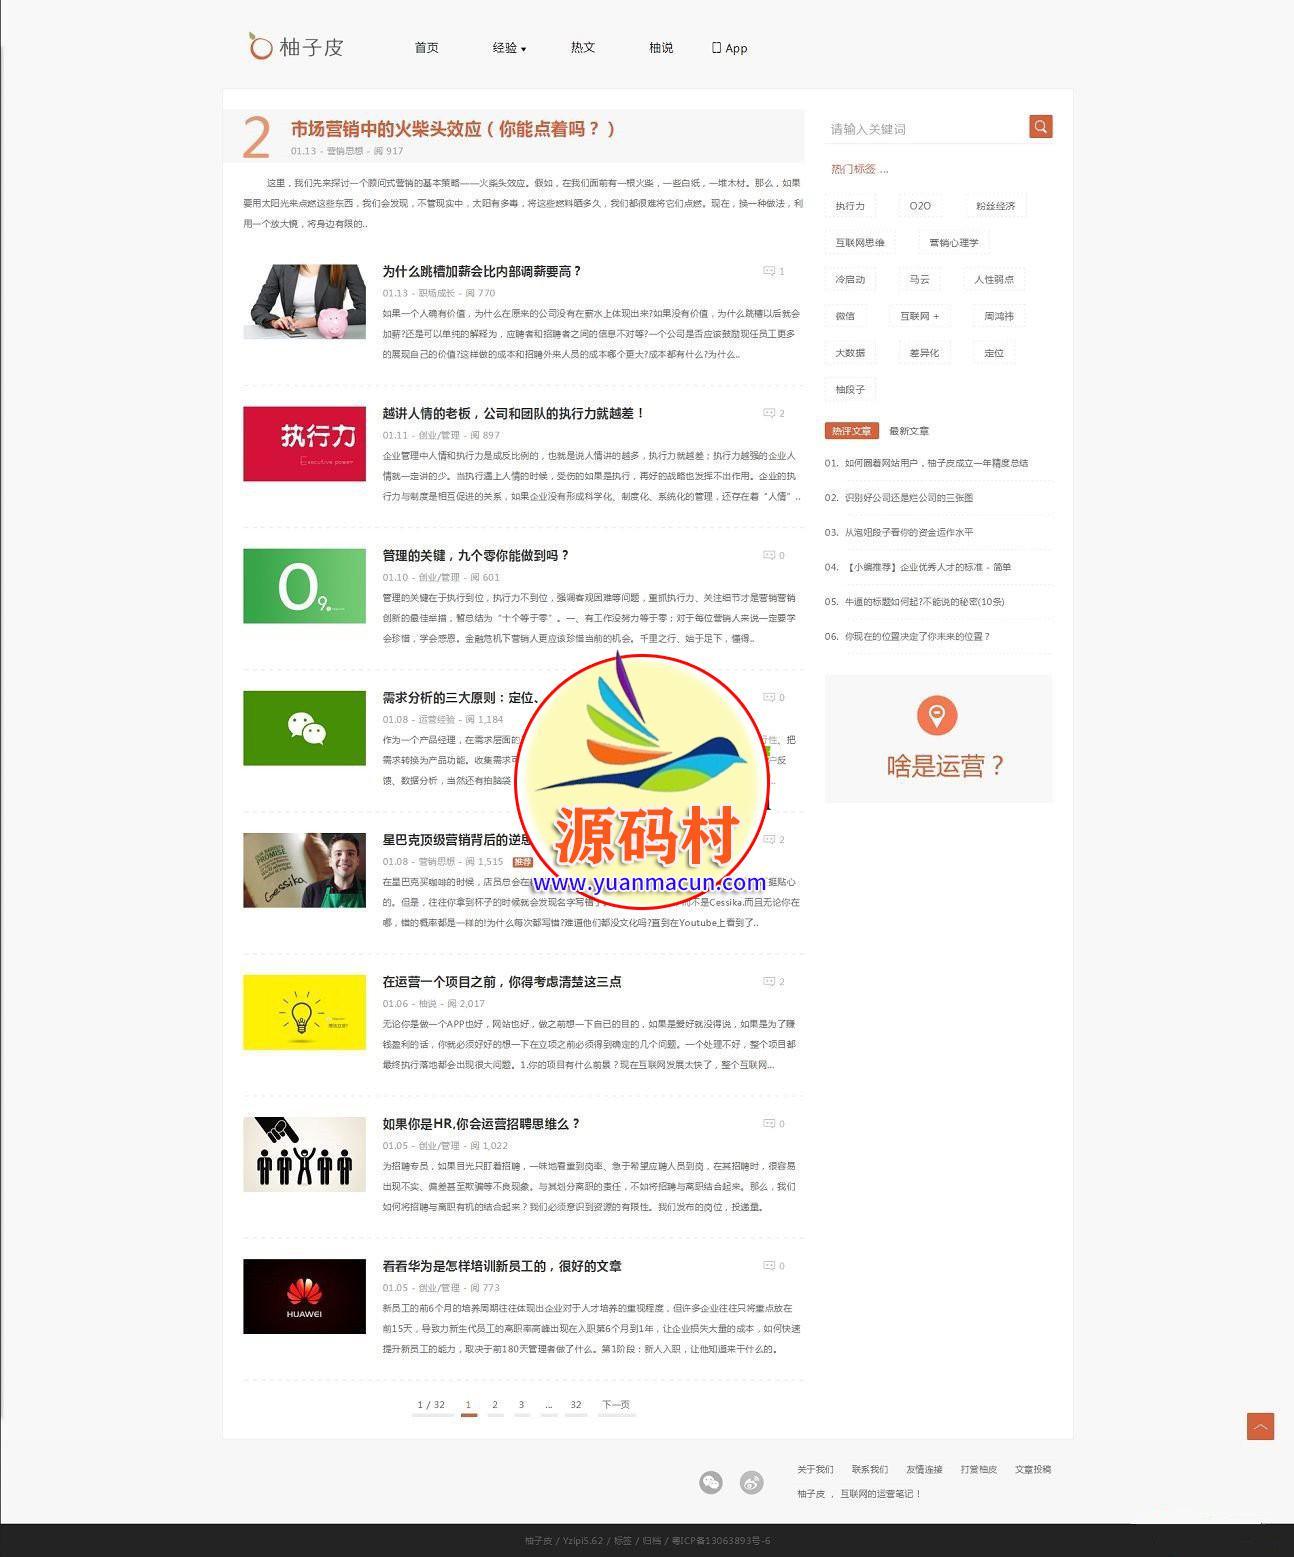 WordPress主题 柚子皮Yzipi5.62 自适应博客主题 附投稿插件 简约清新个人博客自媒体模板扁平自适应